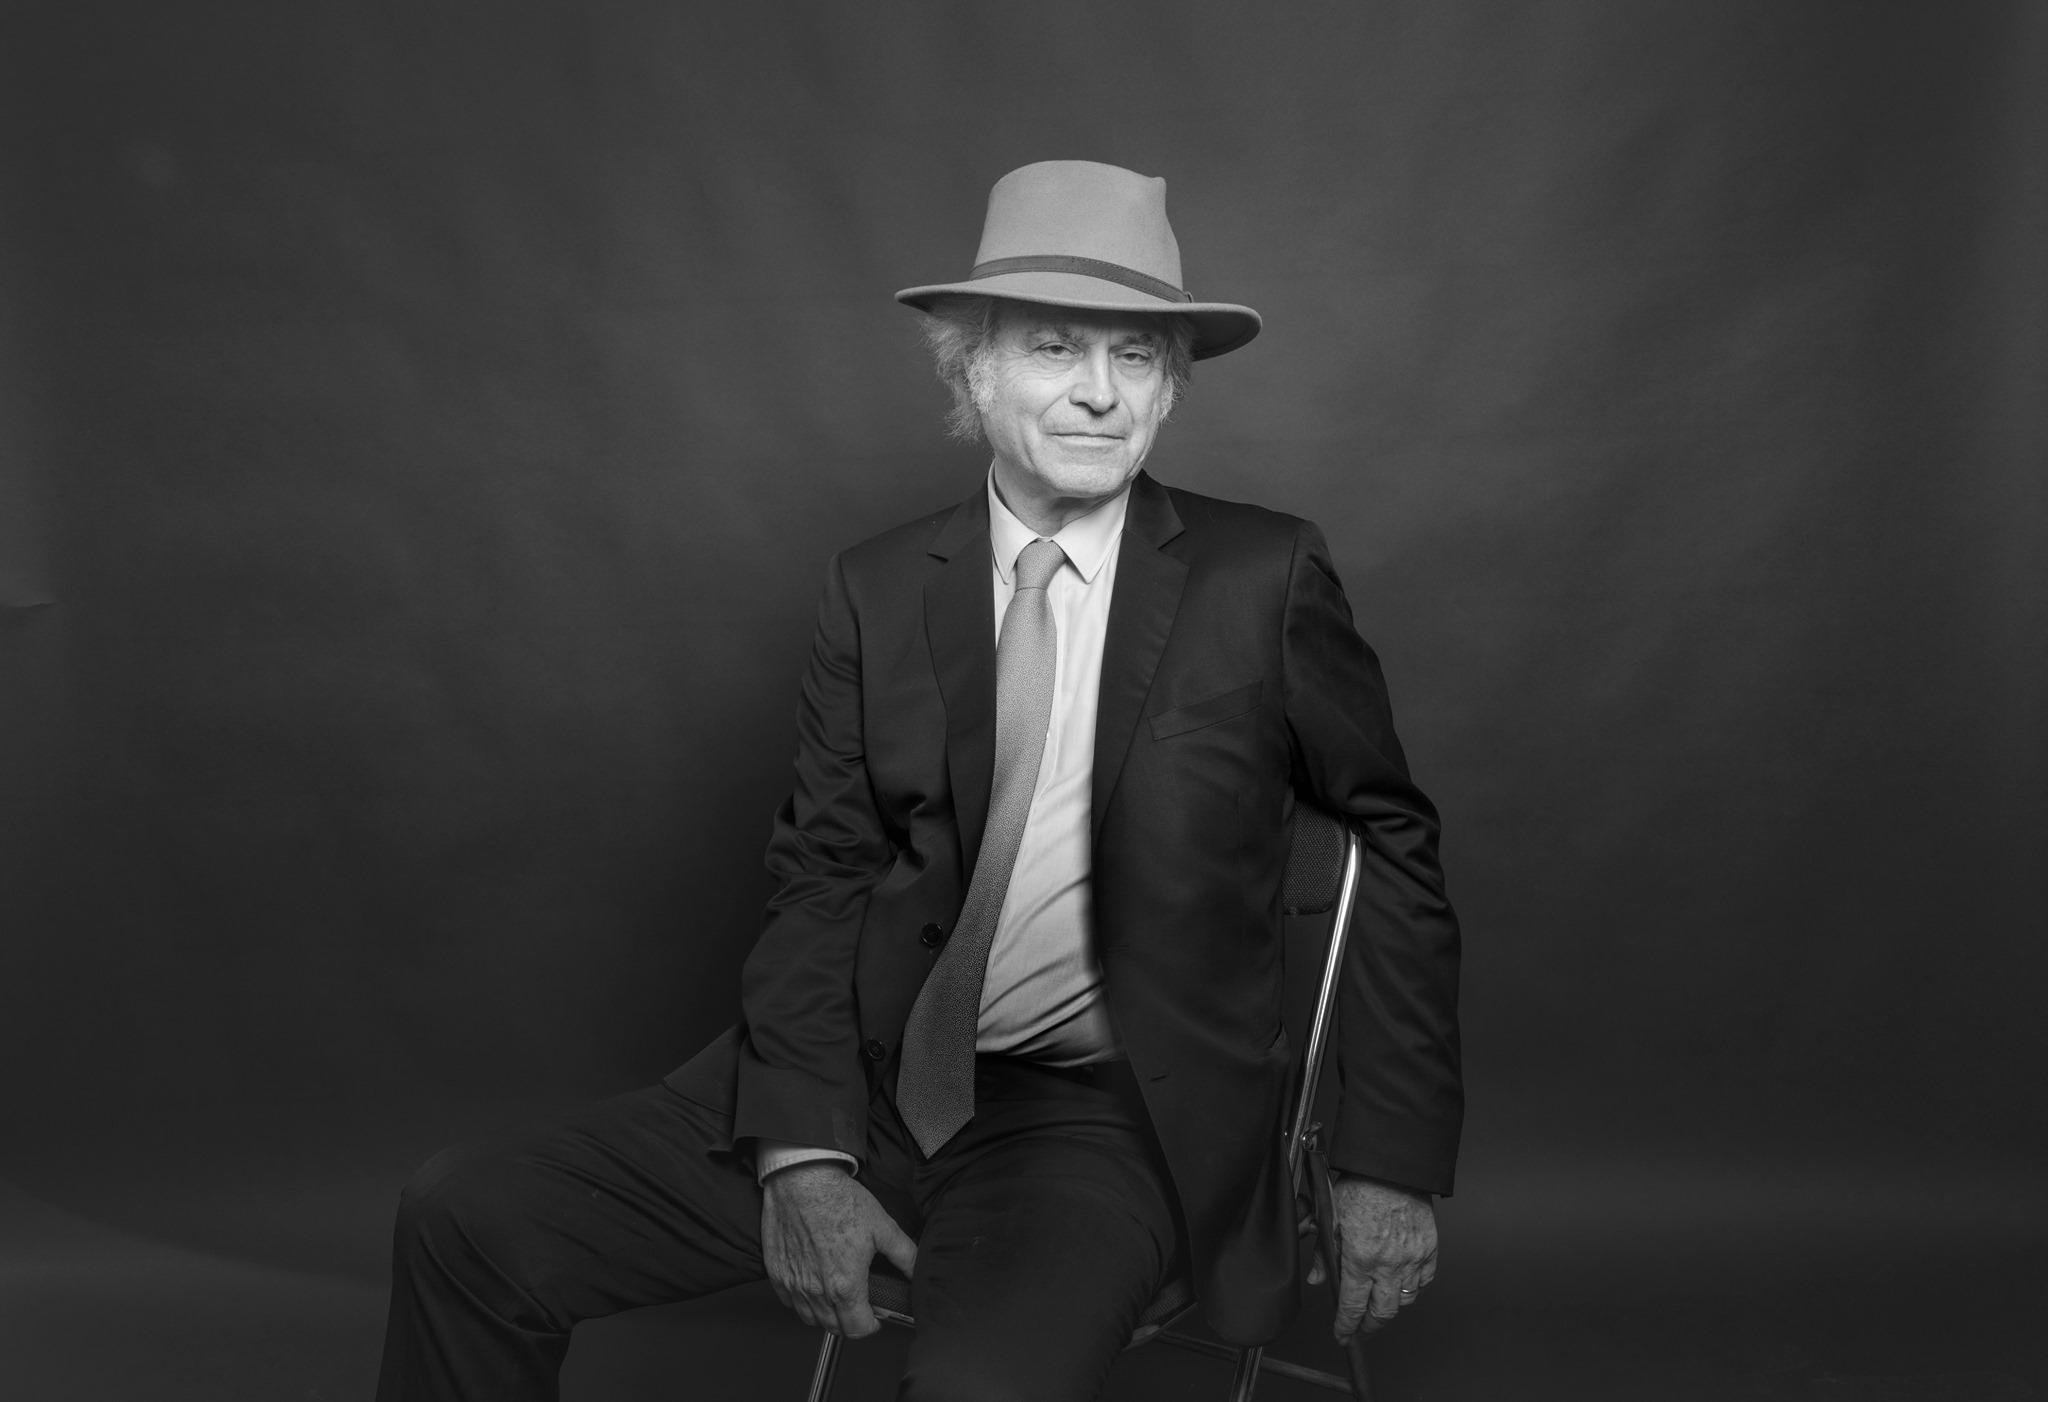 Soirée littéraire exceptionnelle avec Franz-Olivier Giesbert